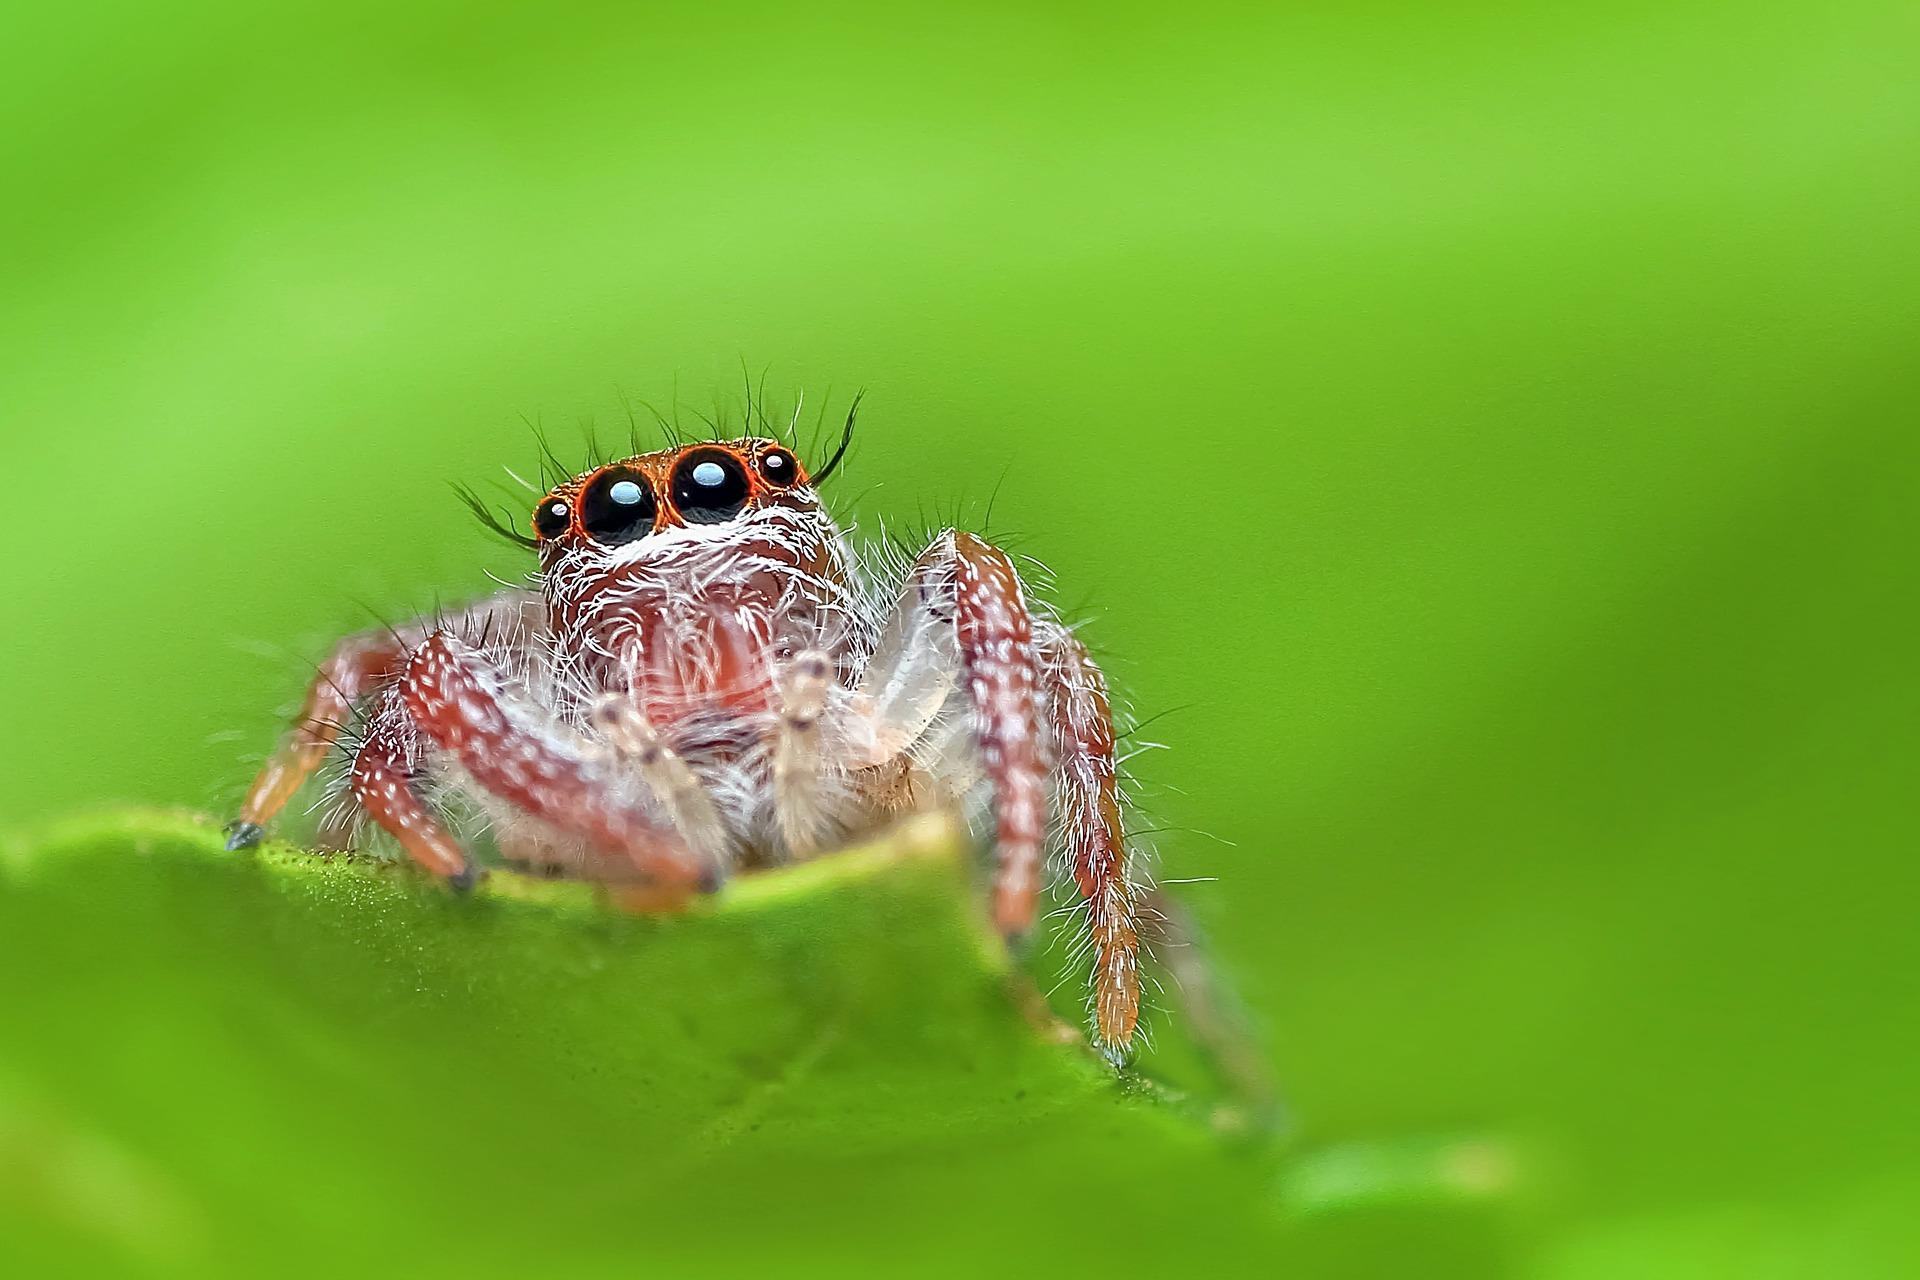 jumping-spider-1091142_1920